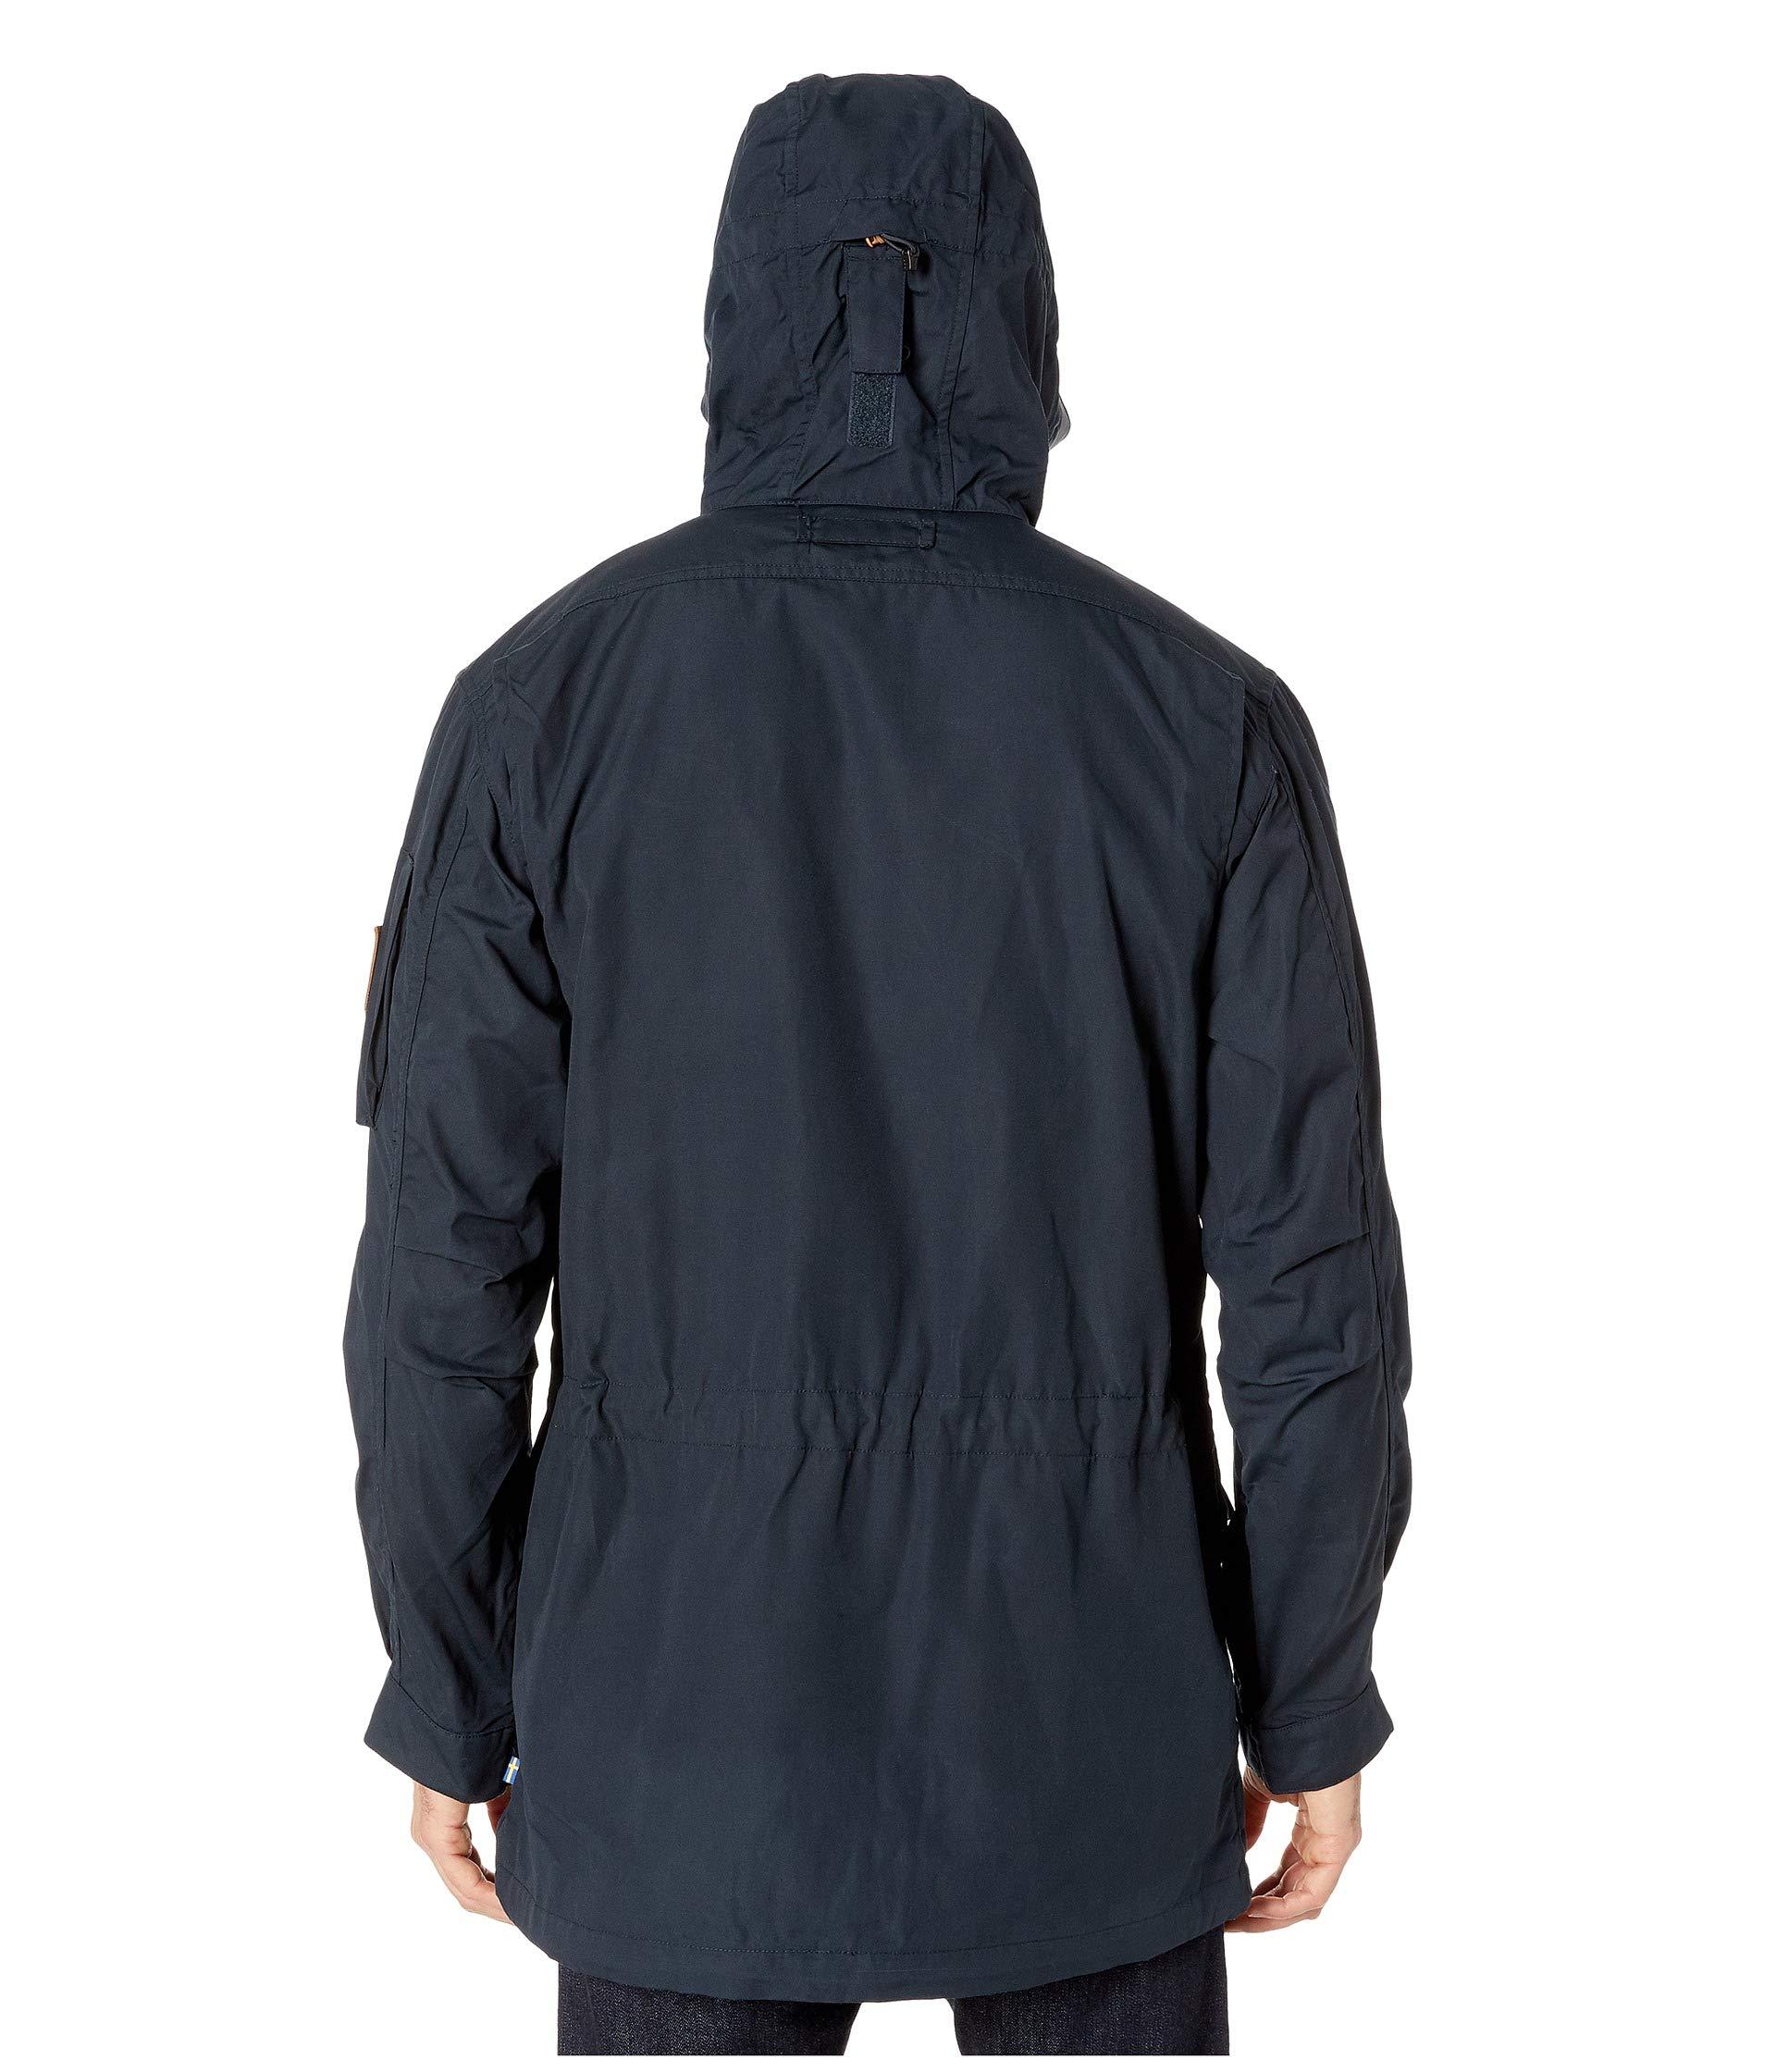 Jacket Sarek Navy Trekking Fjällräven Dark BqXAEBWwxn